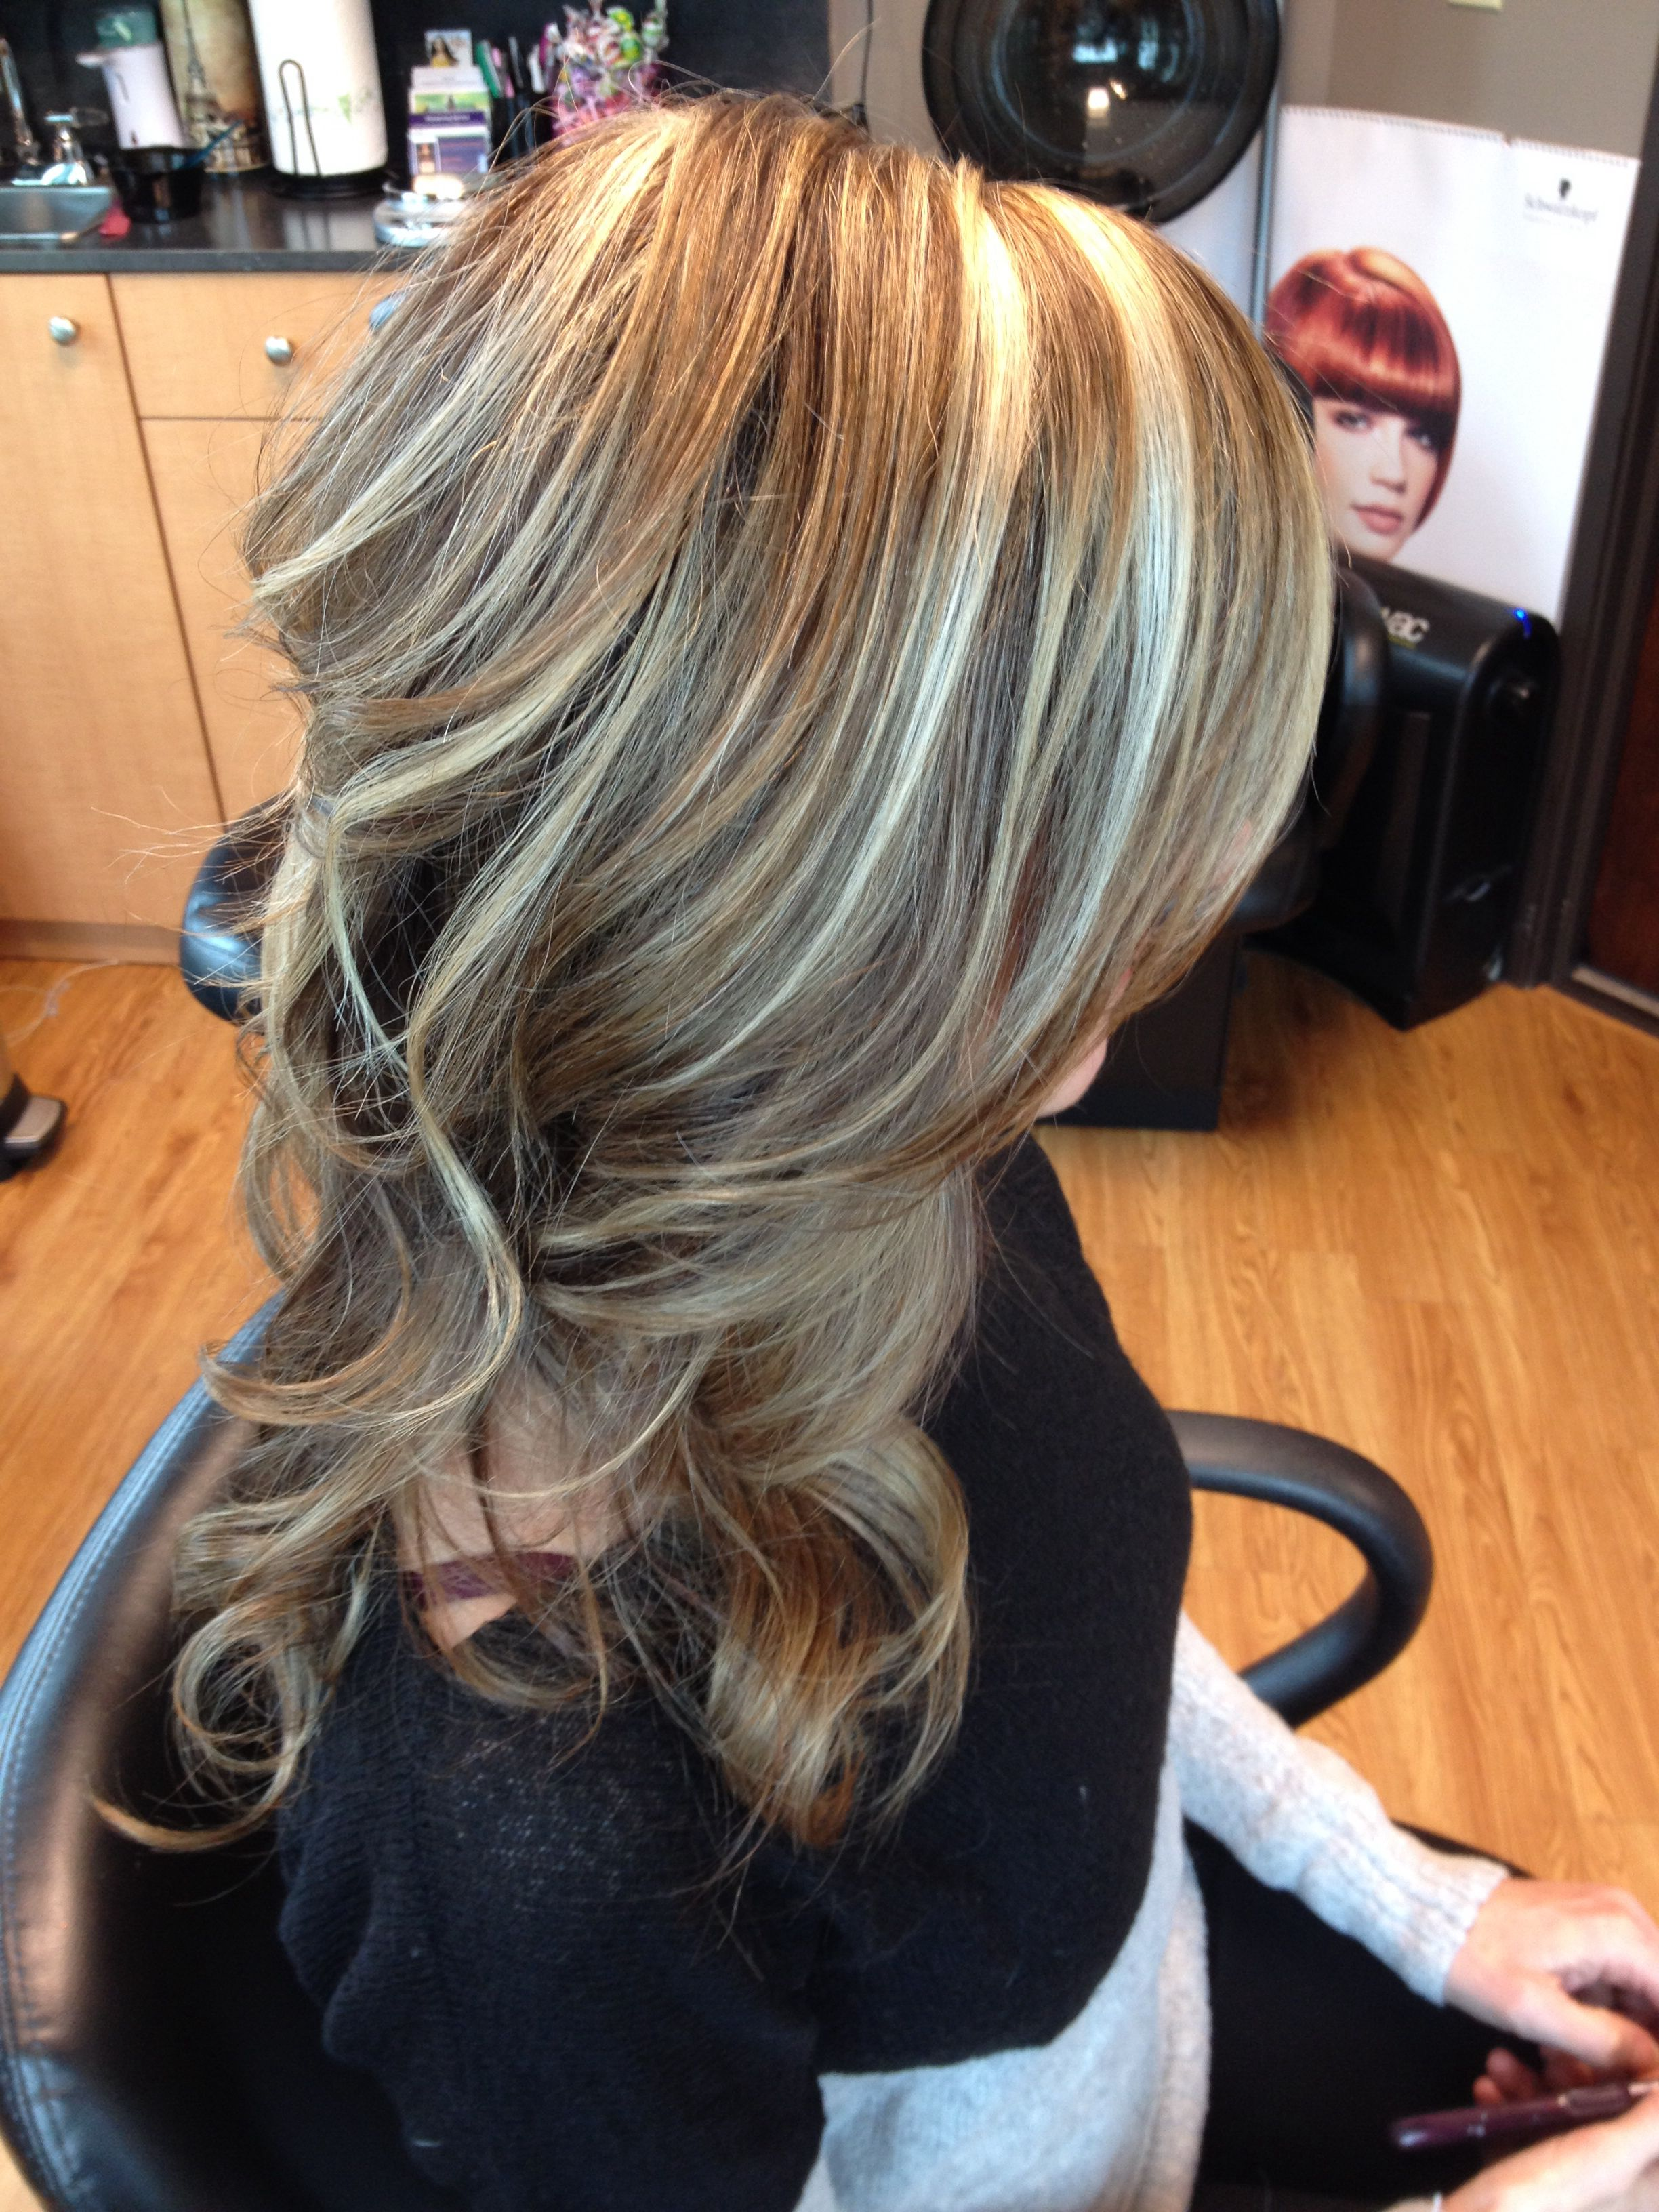 ... | Pinterest | Light Brown Hair, Blonde Highlights and Brown Hair